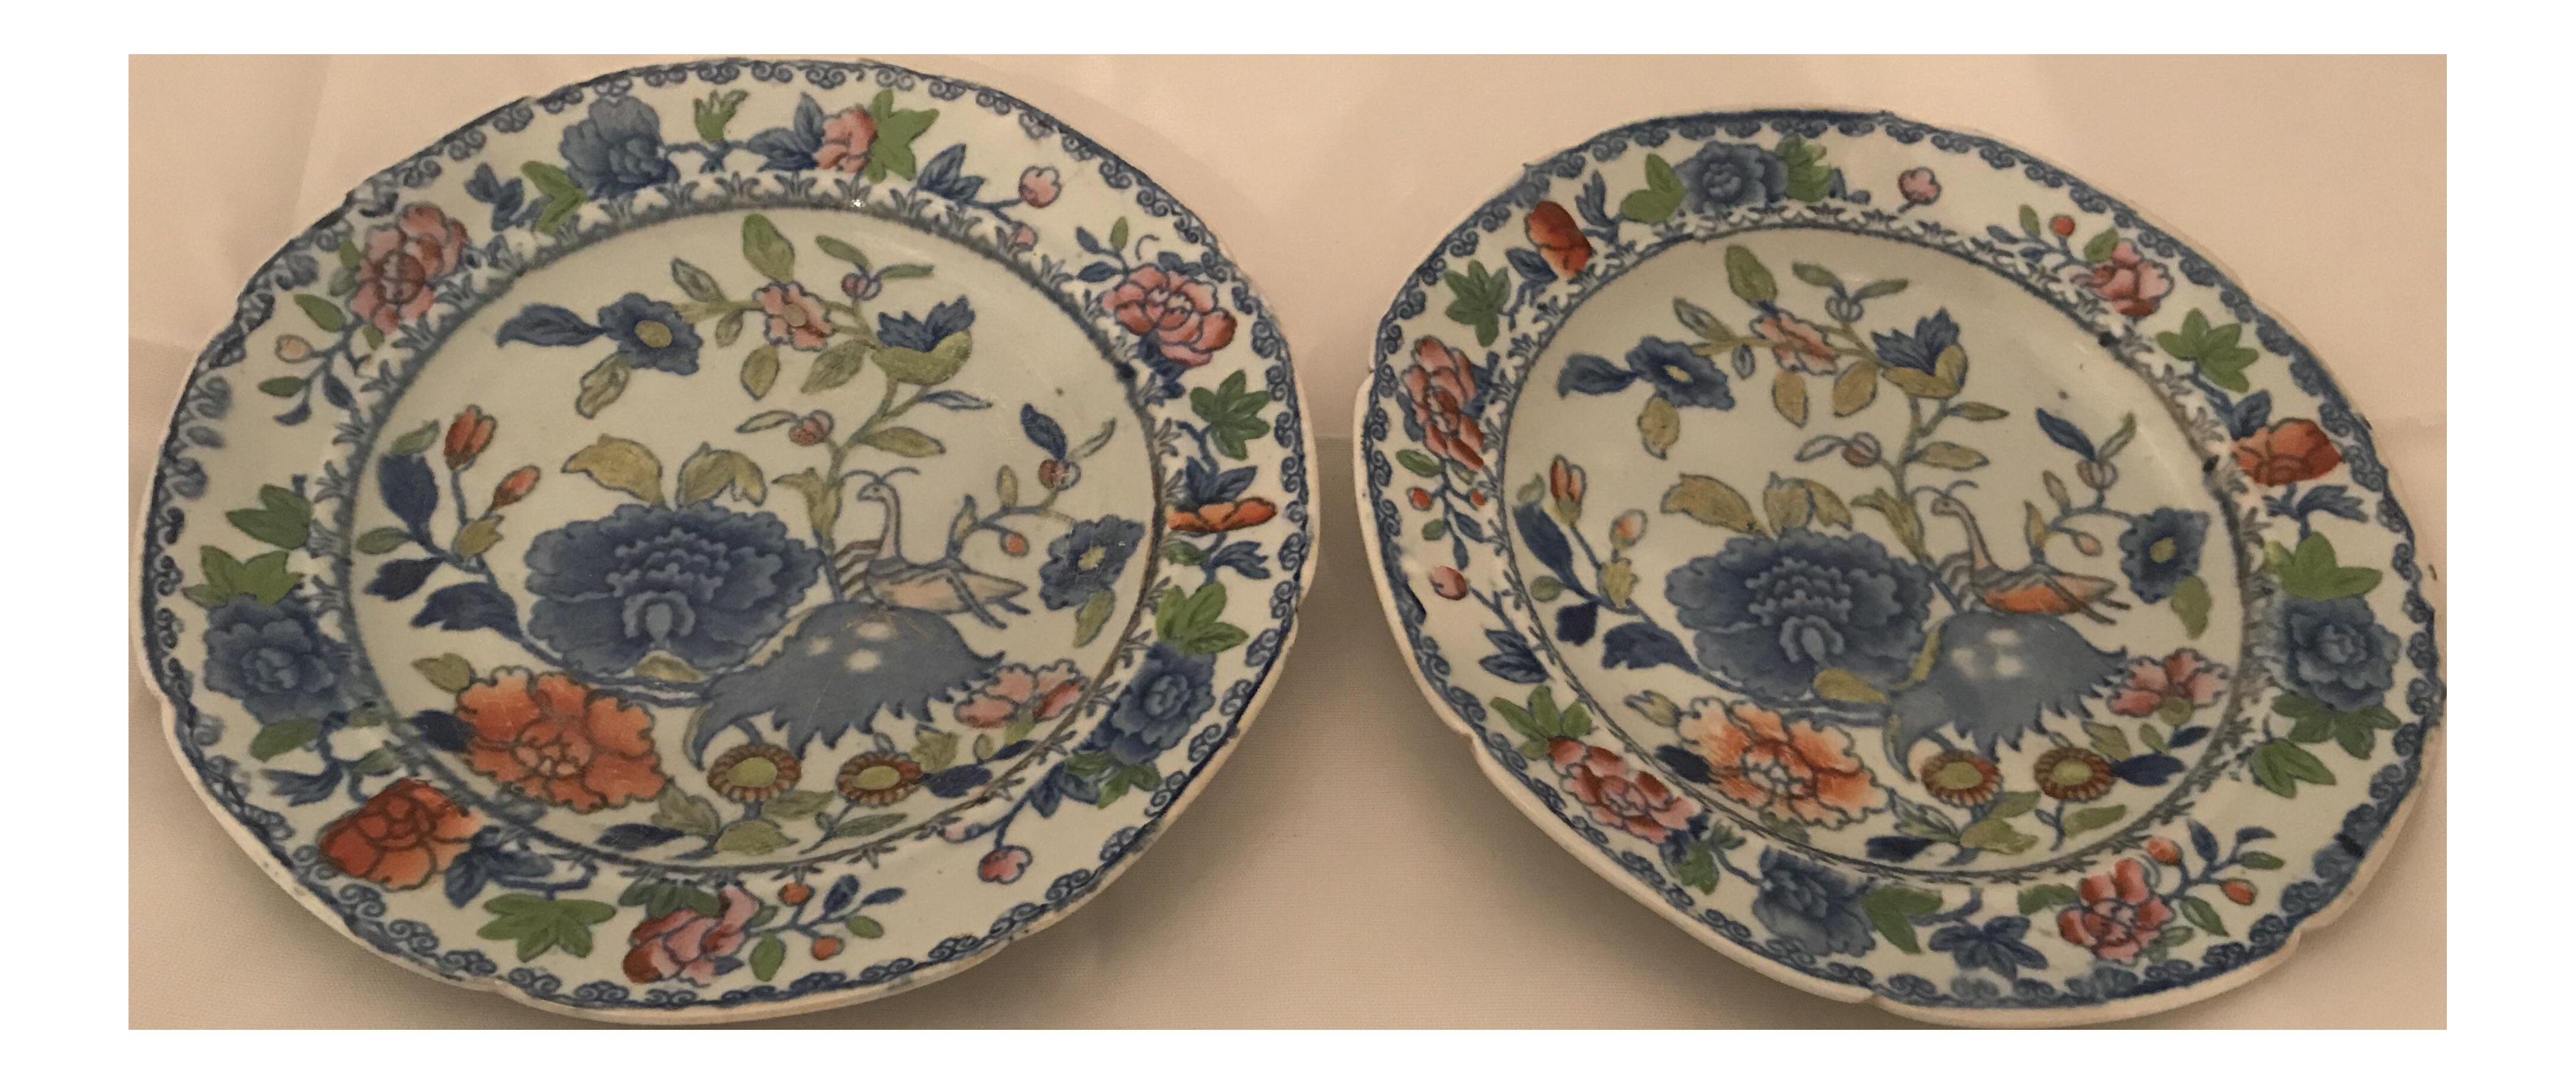 Masons Ironstone Plantation Colonial Salad Plates - a Pair  sc 1 st  Chairish & Masons Ironstone Plantation Colonial Salad Plates - a Pair | Chairish